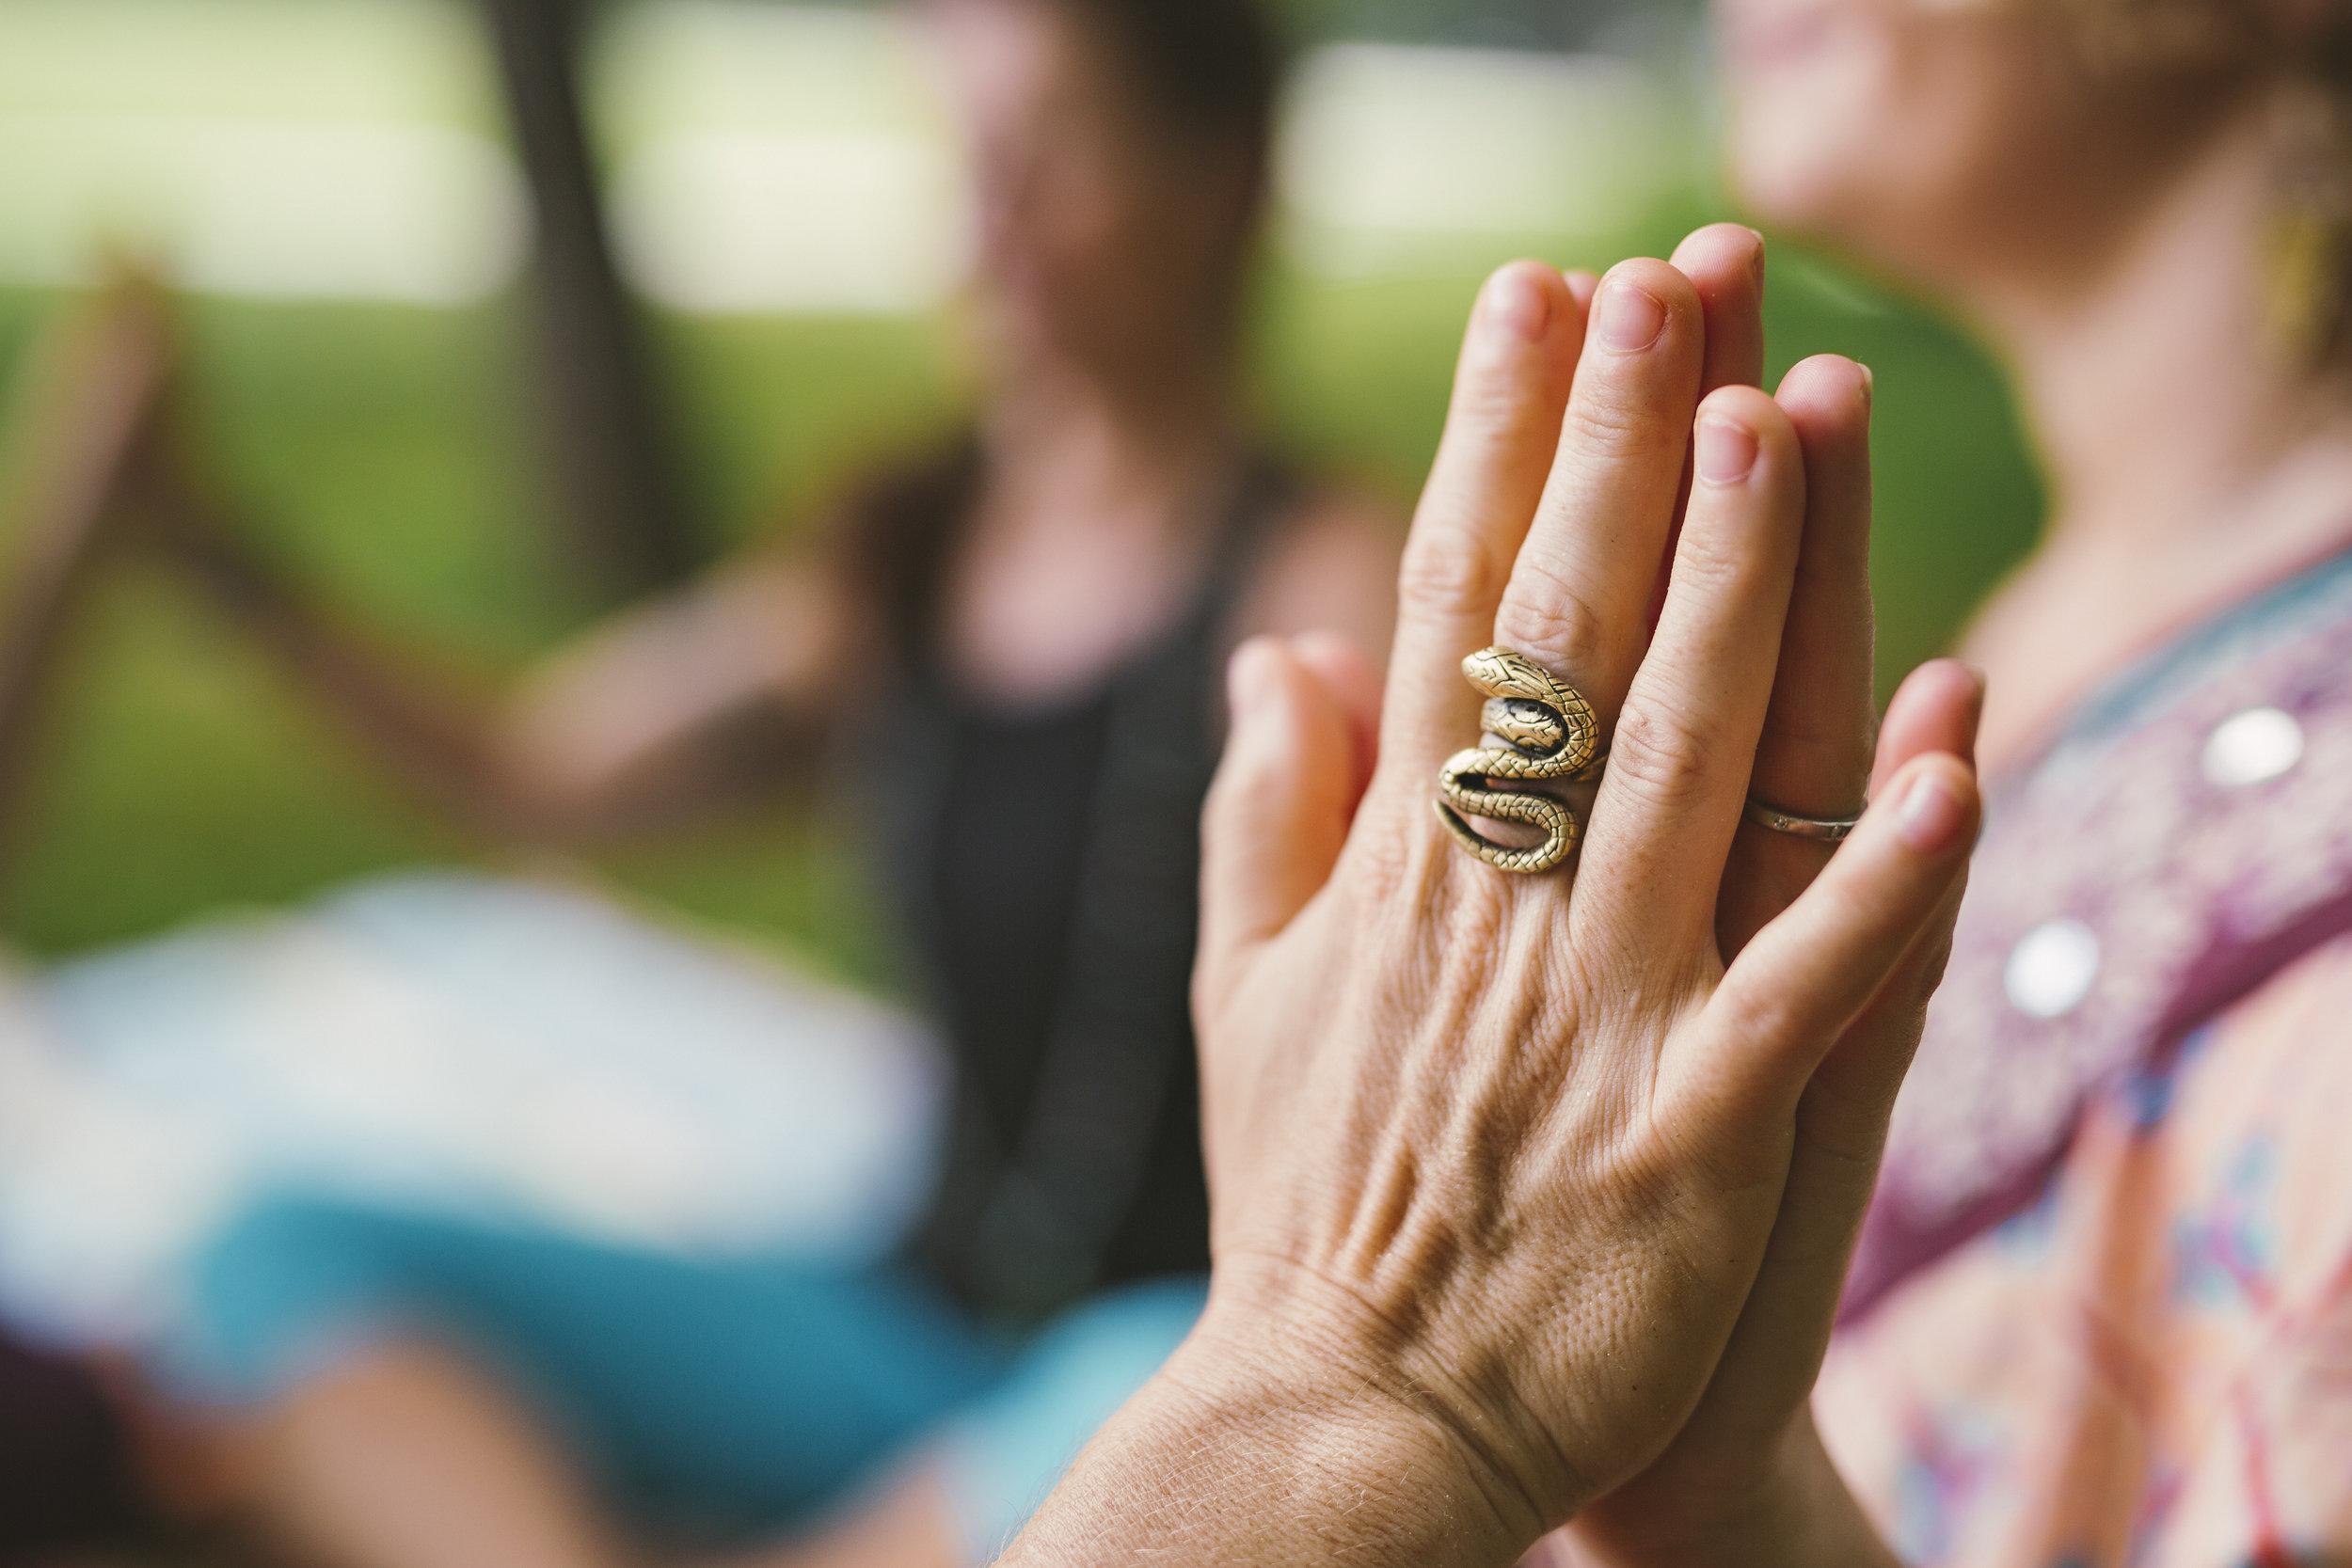 Prana Vinyasa Yoga Teacher Training Raleigh, NC Durham, NC Chapel Hill, NC Carborro, NC